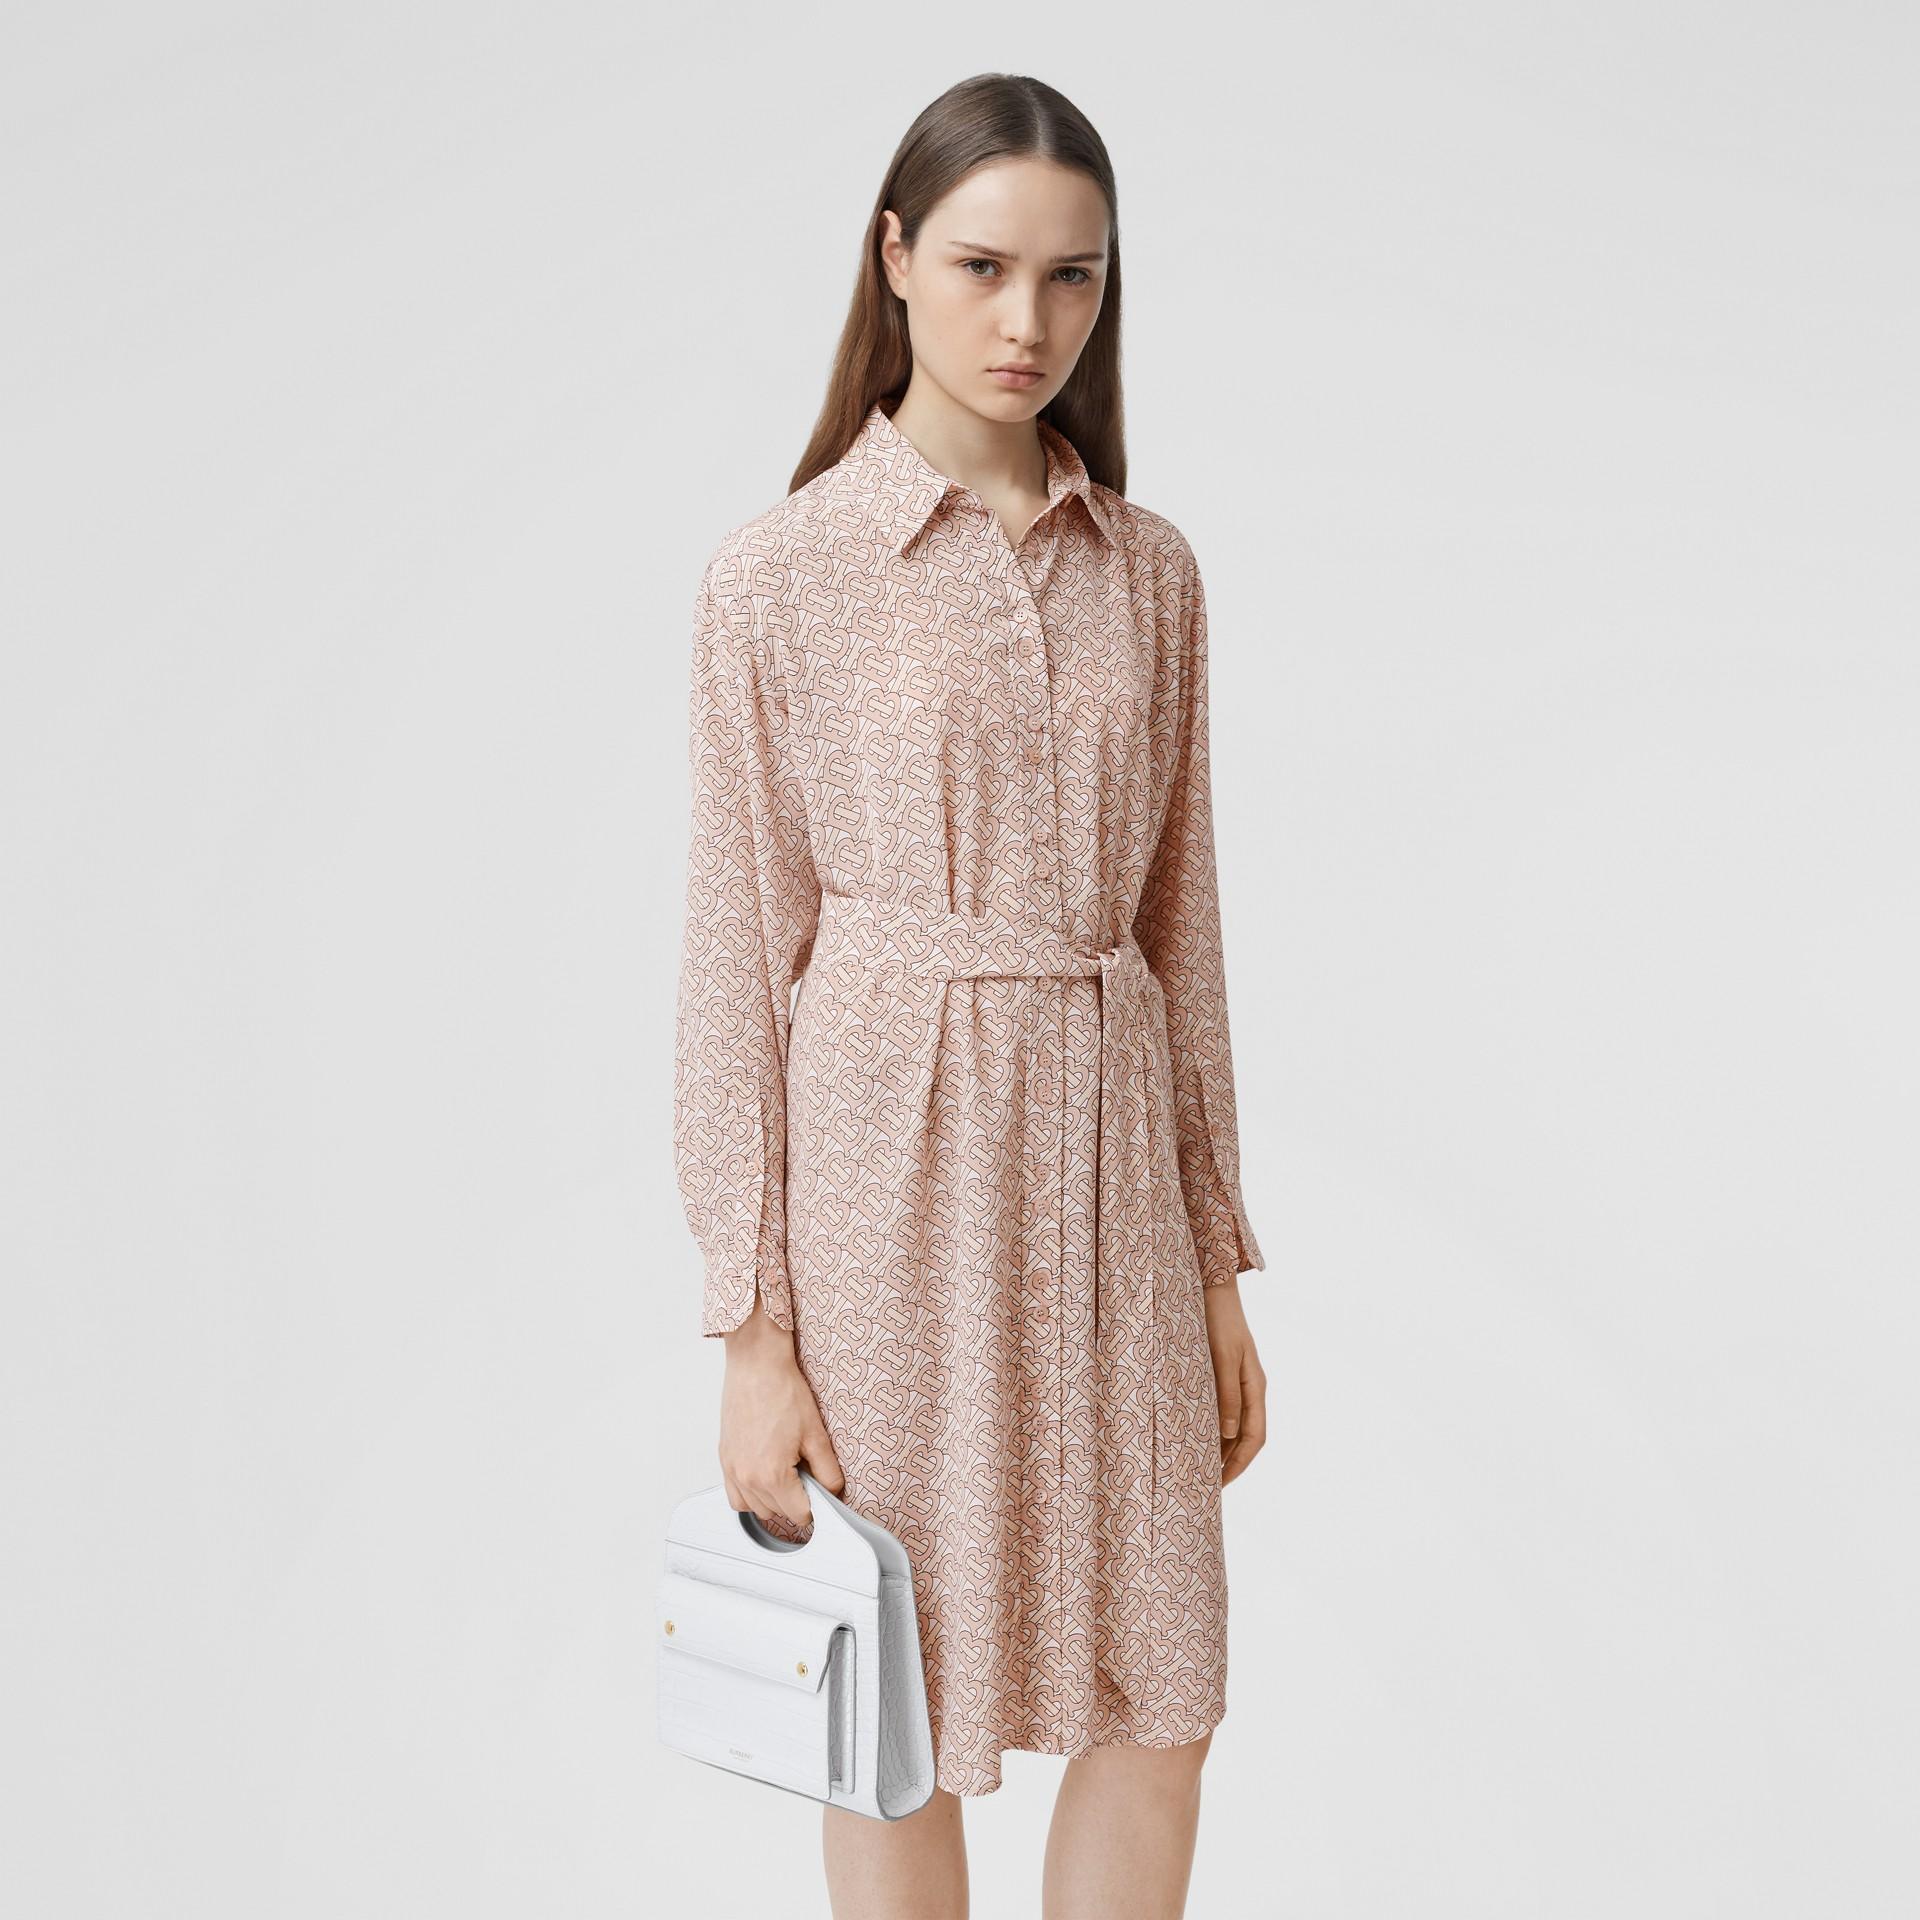 Monogram Print Silk Crepe De Chine Shirt Dress in Pale Copper Pink - Women | Burberry Hong Kong S.A.R - gallery image 5